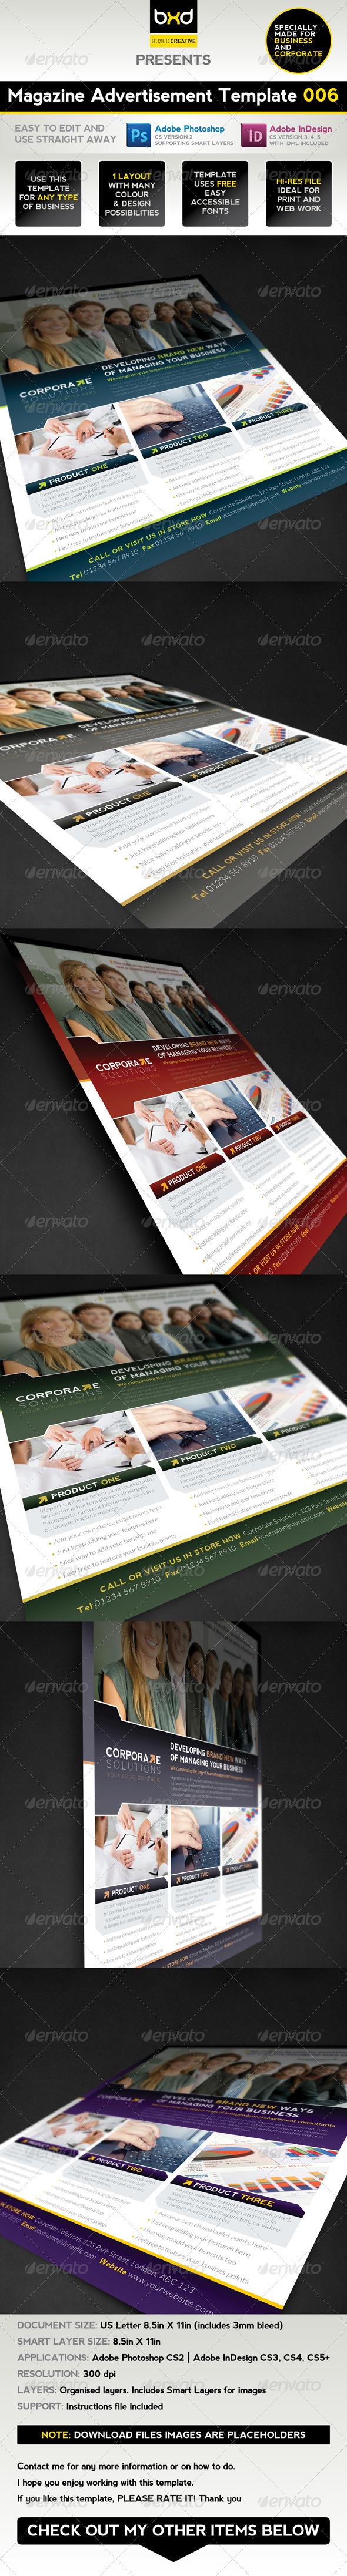 GraphicRiver Magazine Advert Template 006 1709843